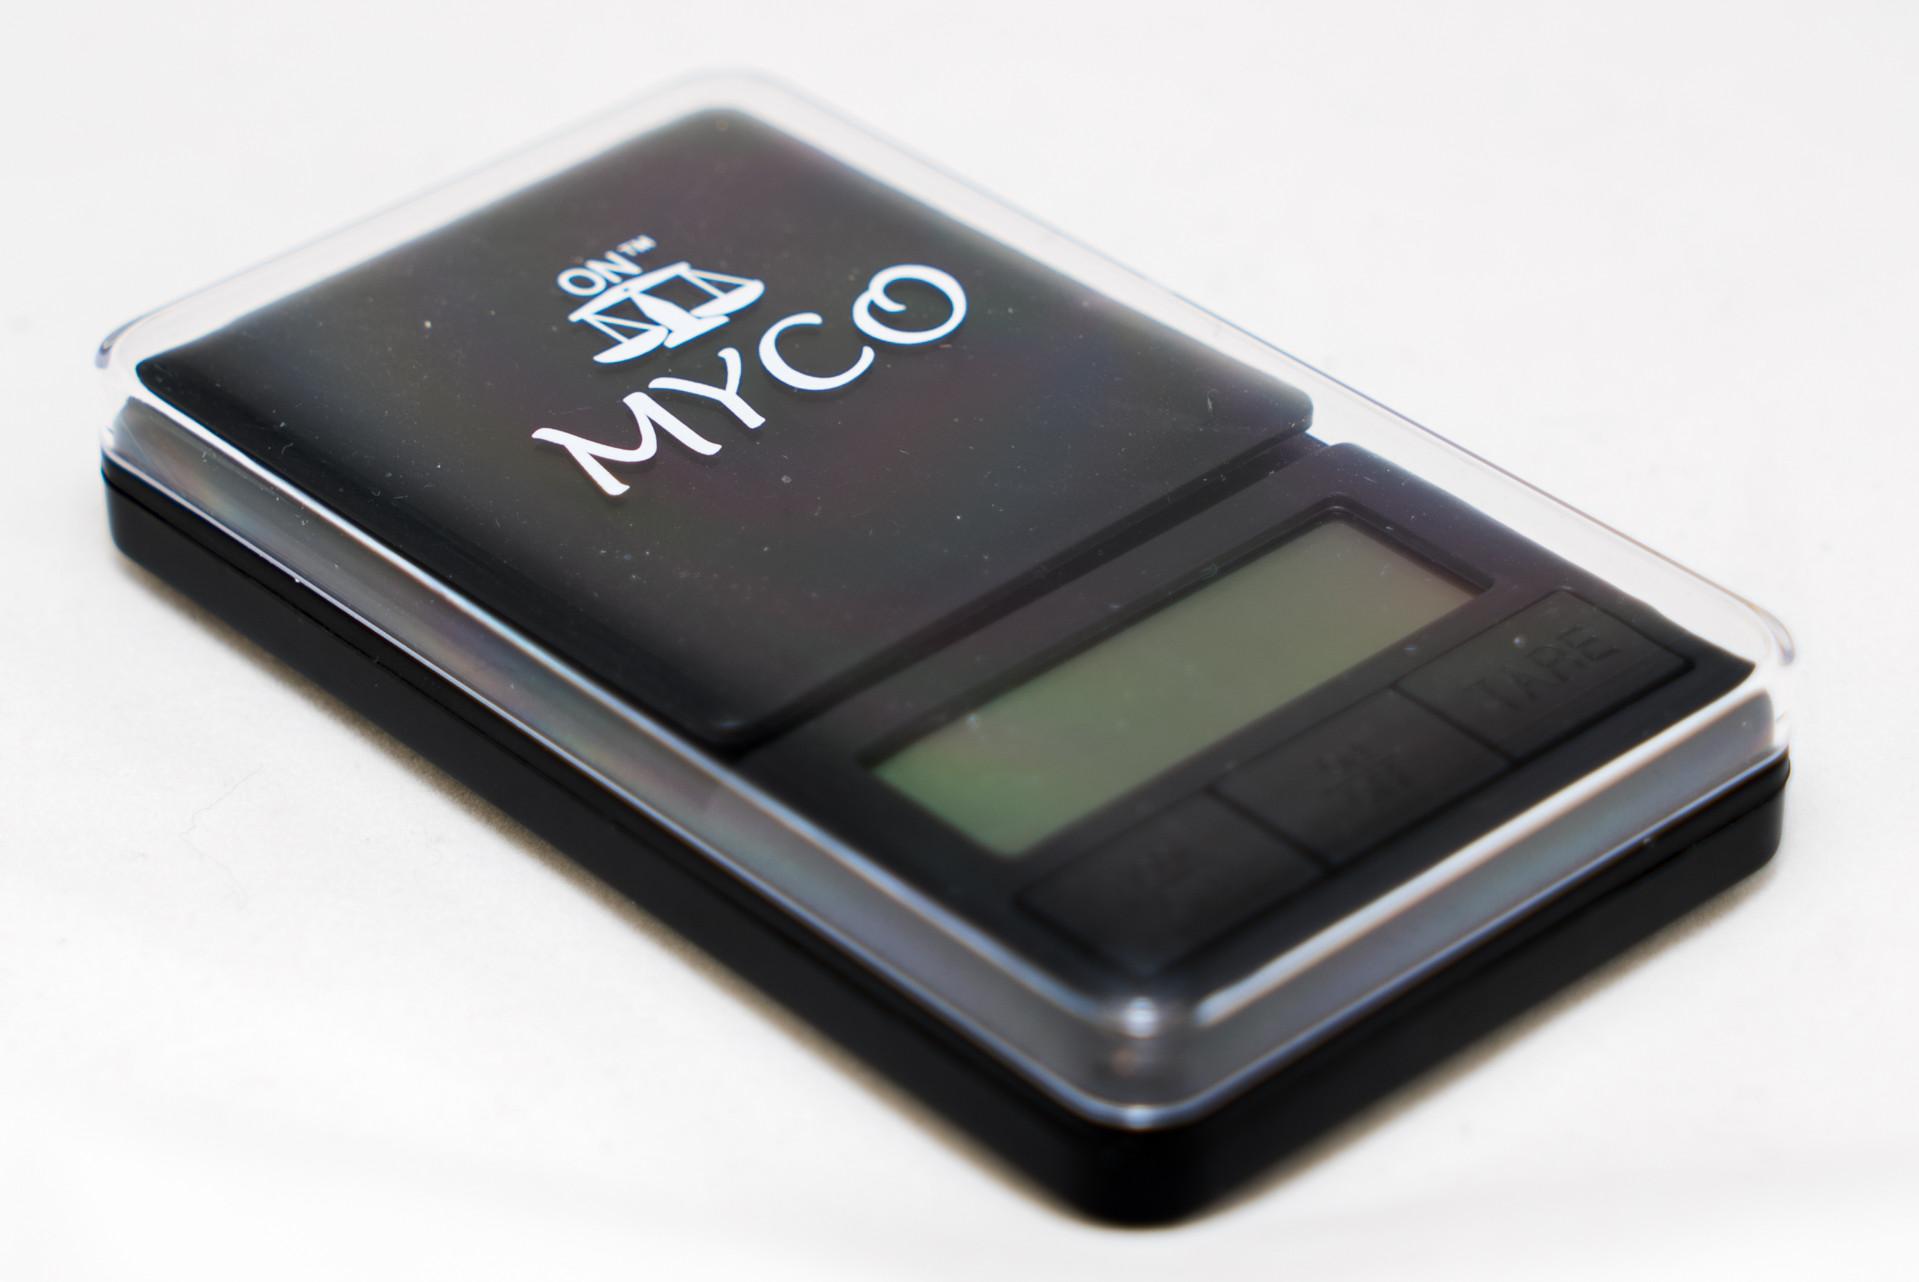 Myco MV-Series Miniscale (100g x 0.01g)